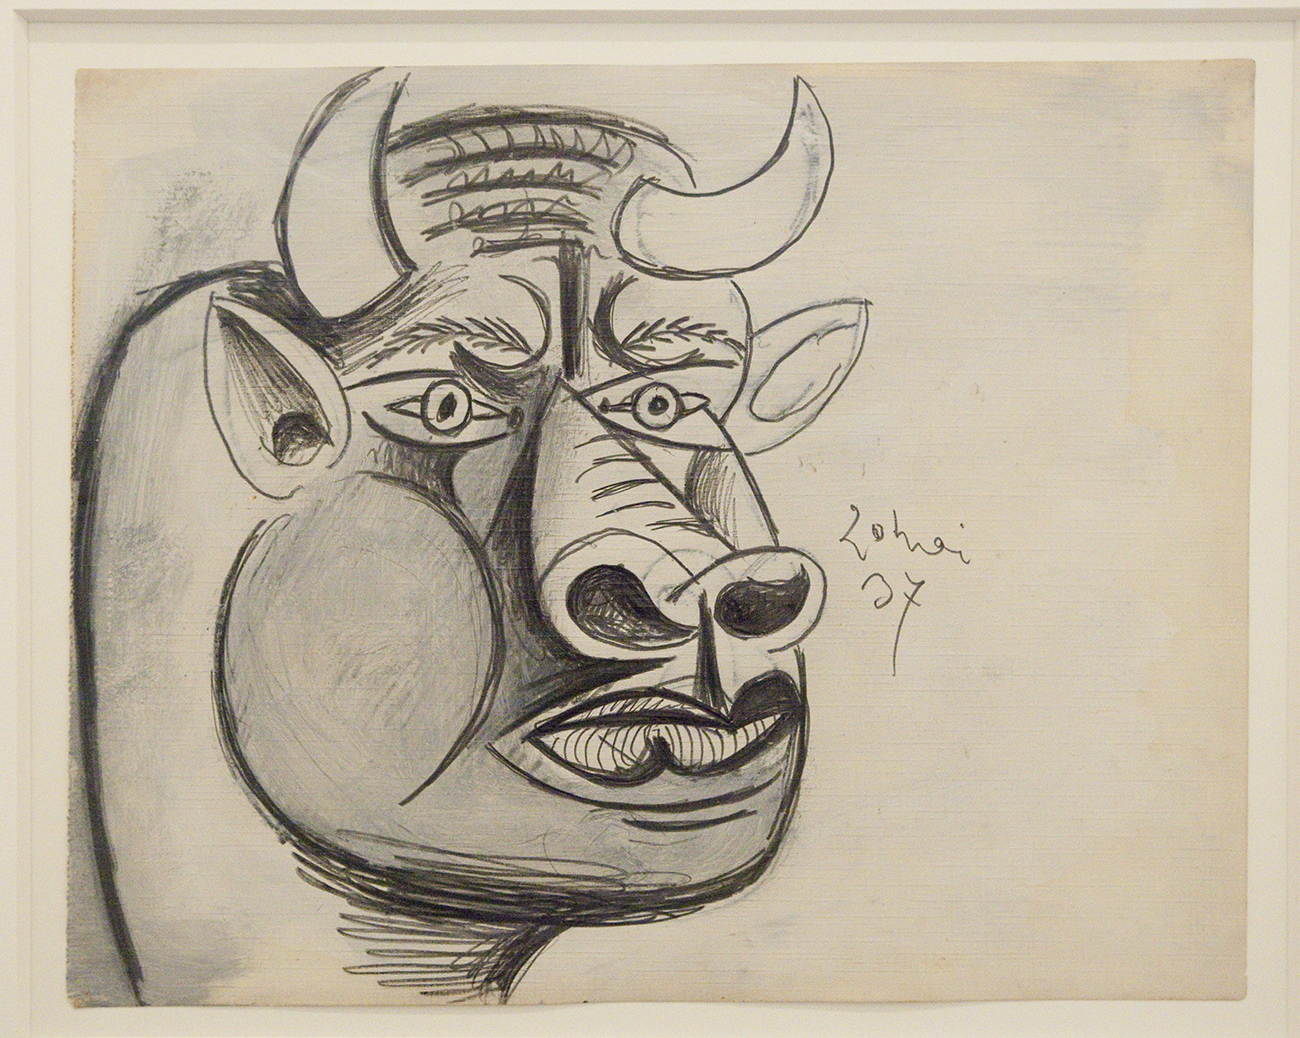 mirena-rhee-bull-picasso-preparatory-drawing-for-guernika.jpg